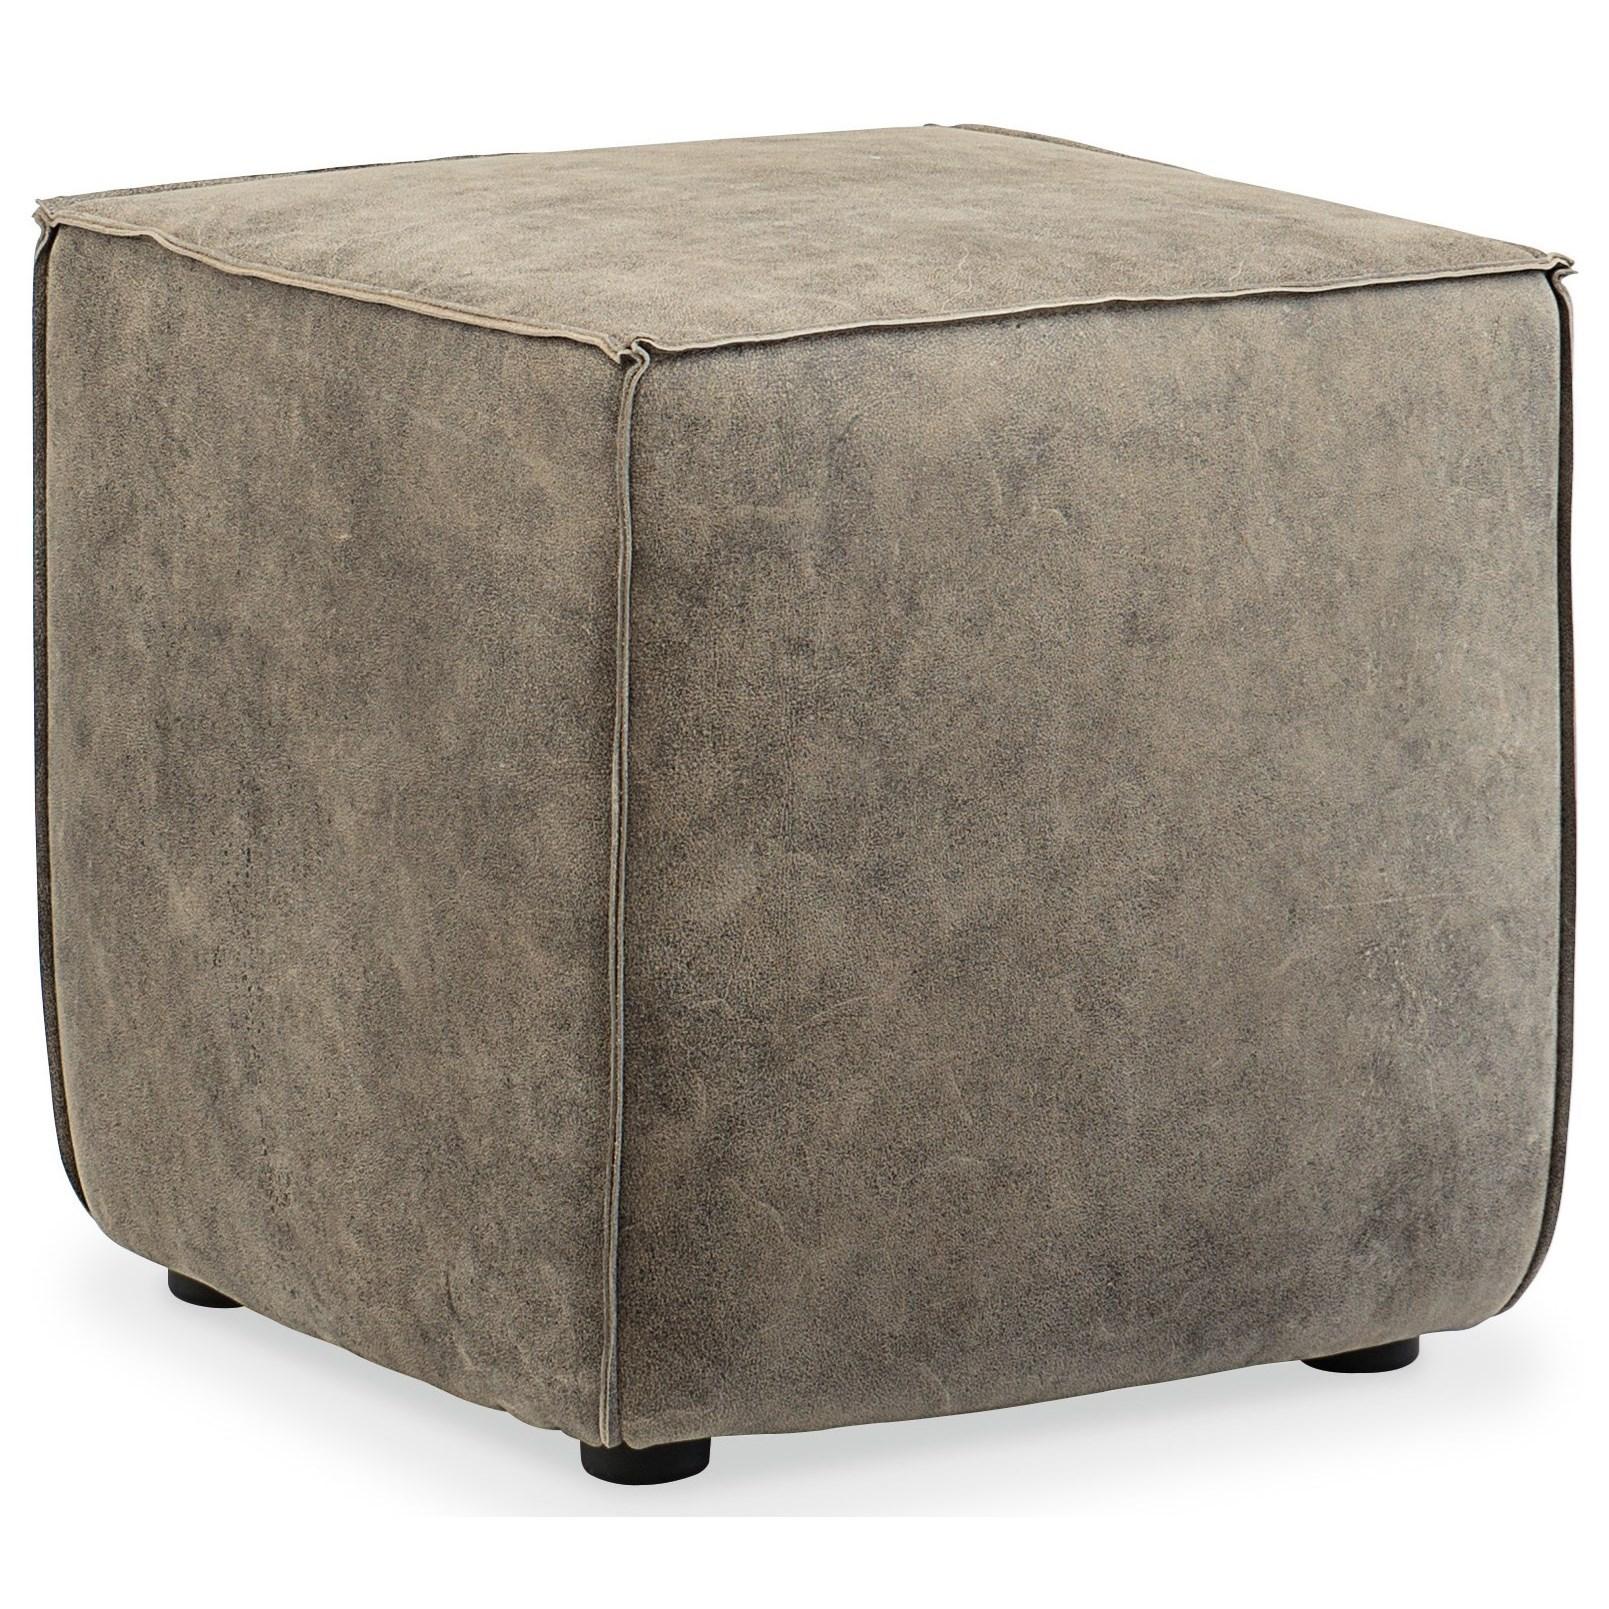 CO39 Quebert Cube Ottoman by Hooker Furniture at Baer's Furniture